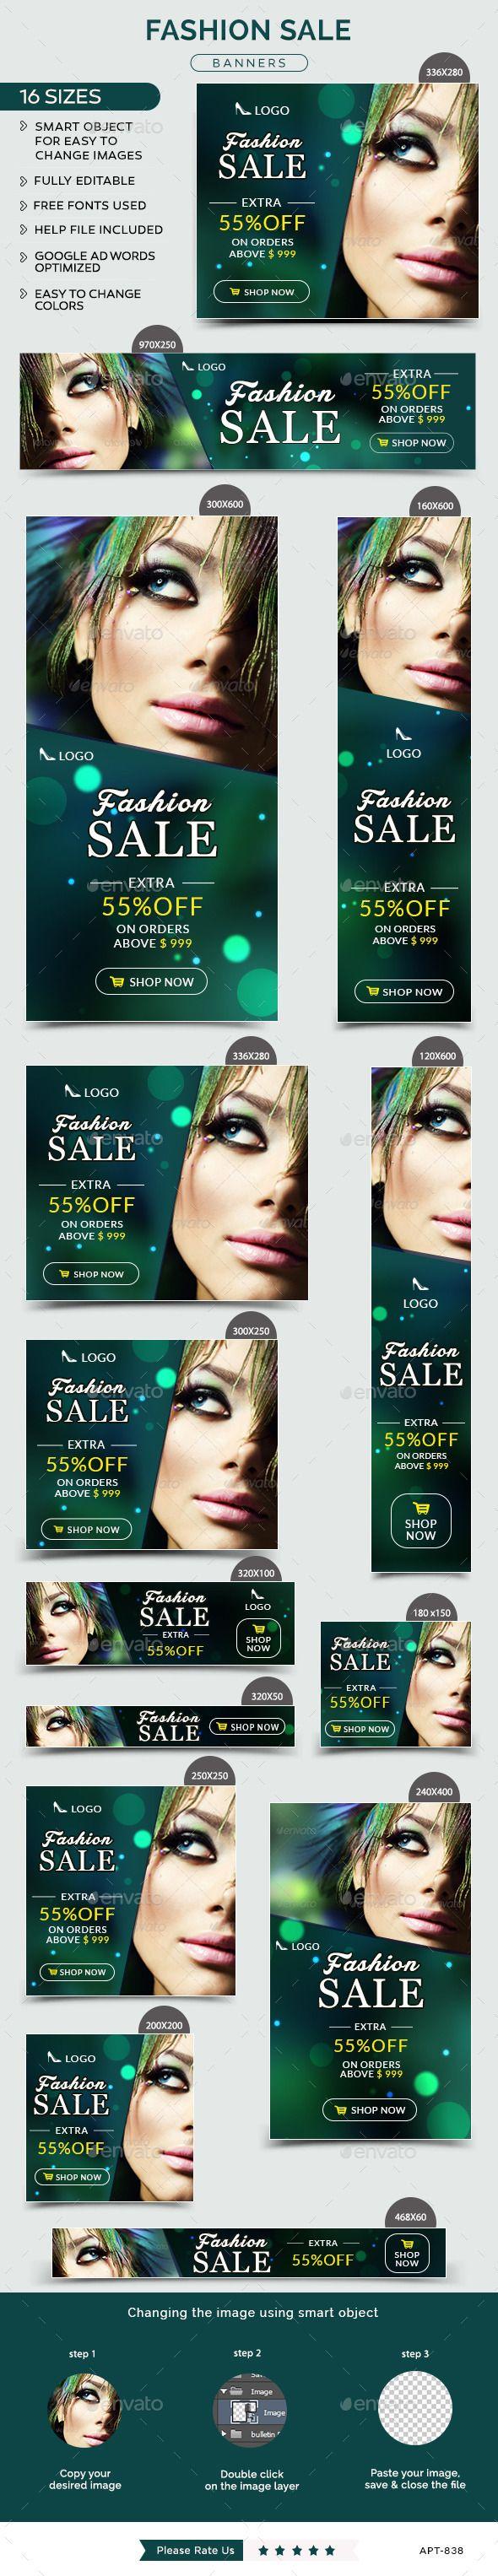 Fashion Sale Banners Template #design Download: http://graphicriver.net/item/fashion-sale-banners/12425038?ref=ksioks